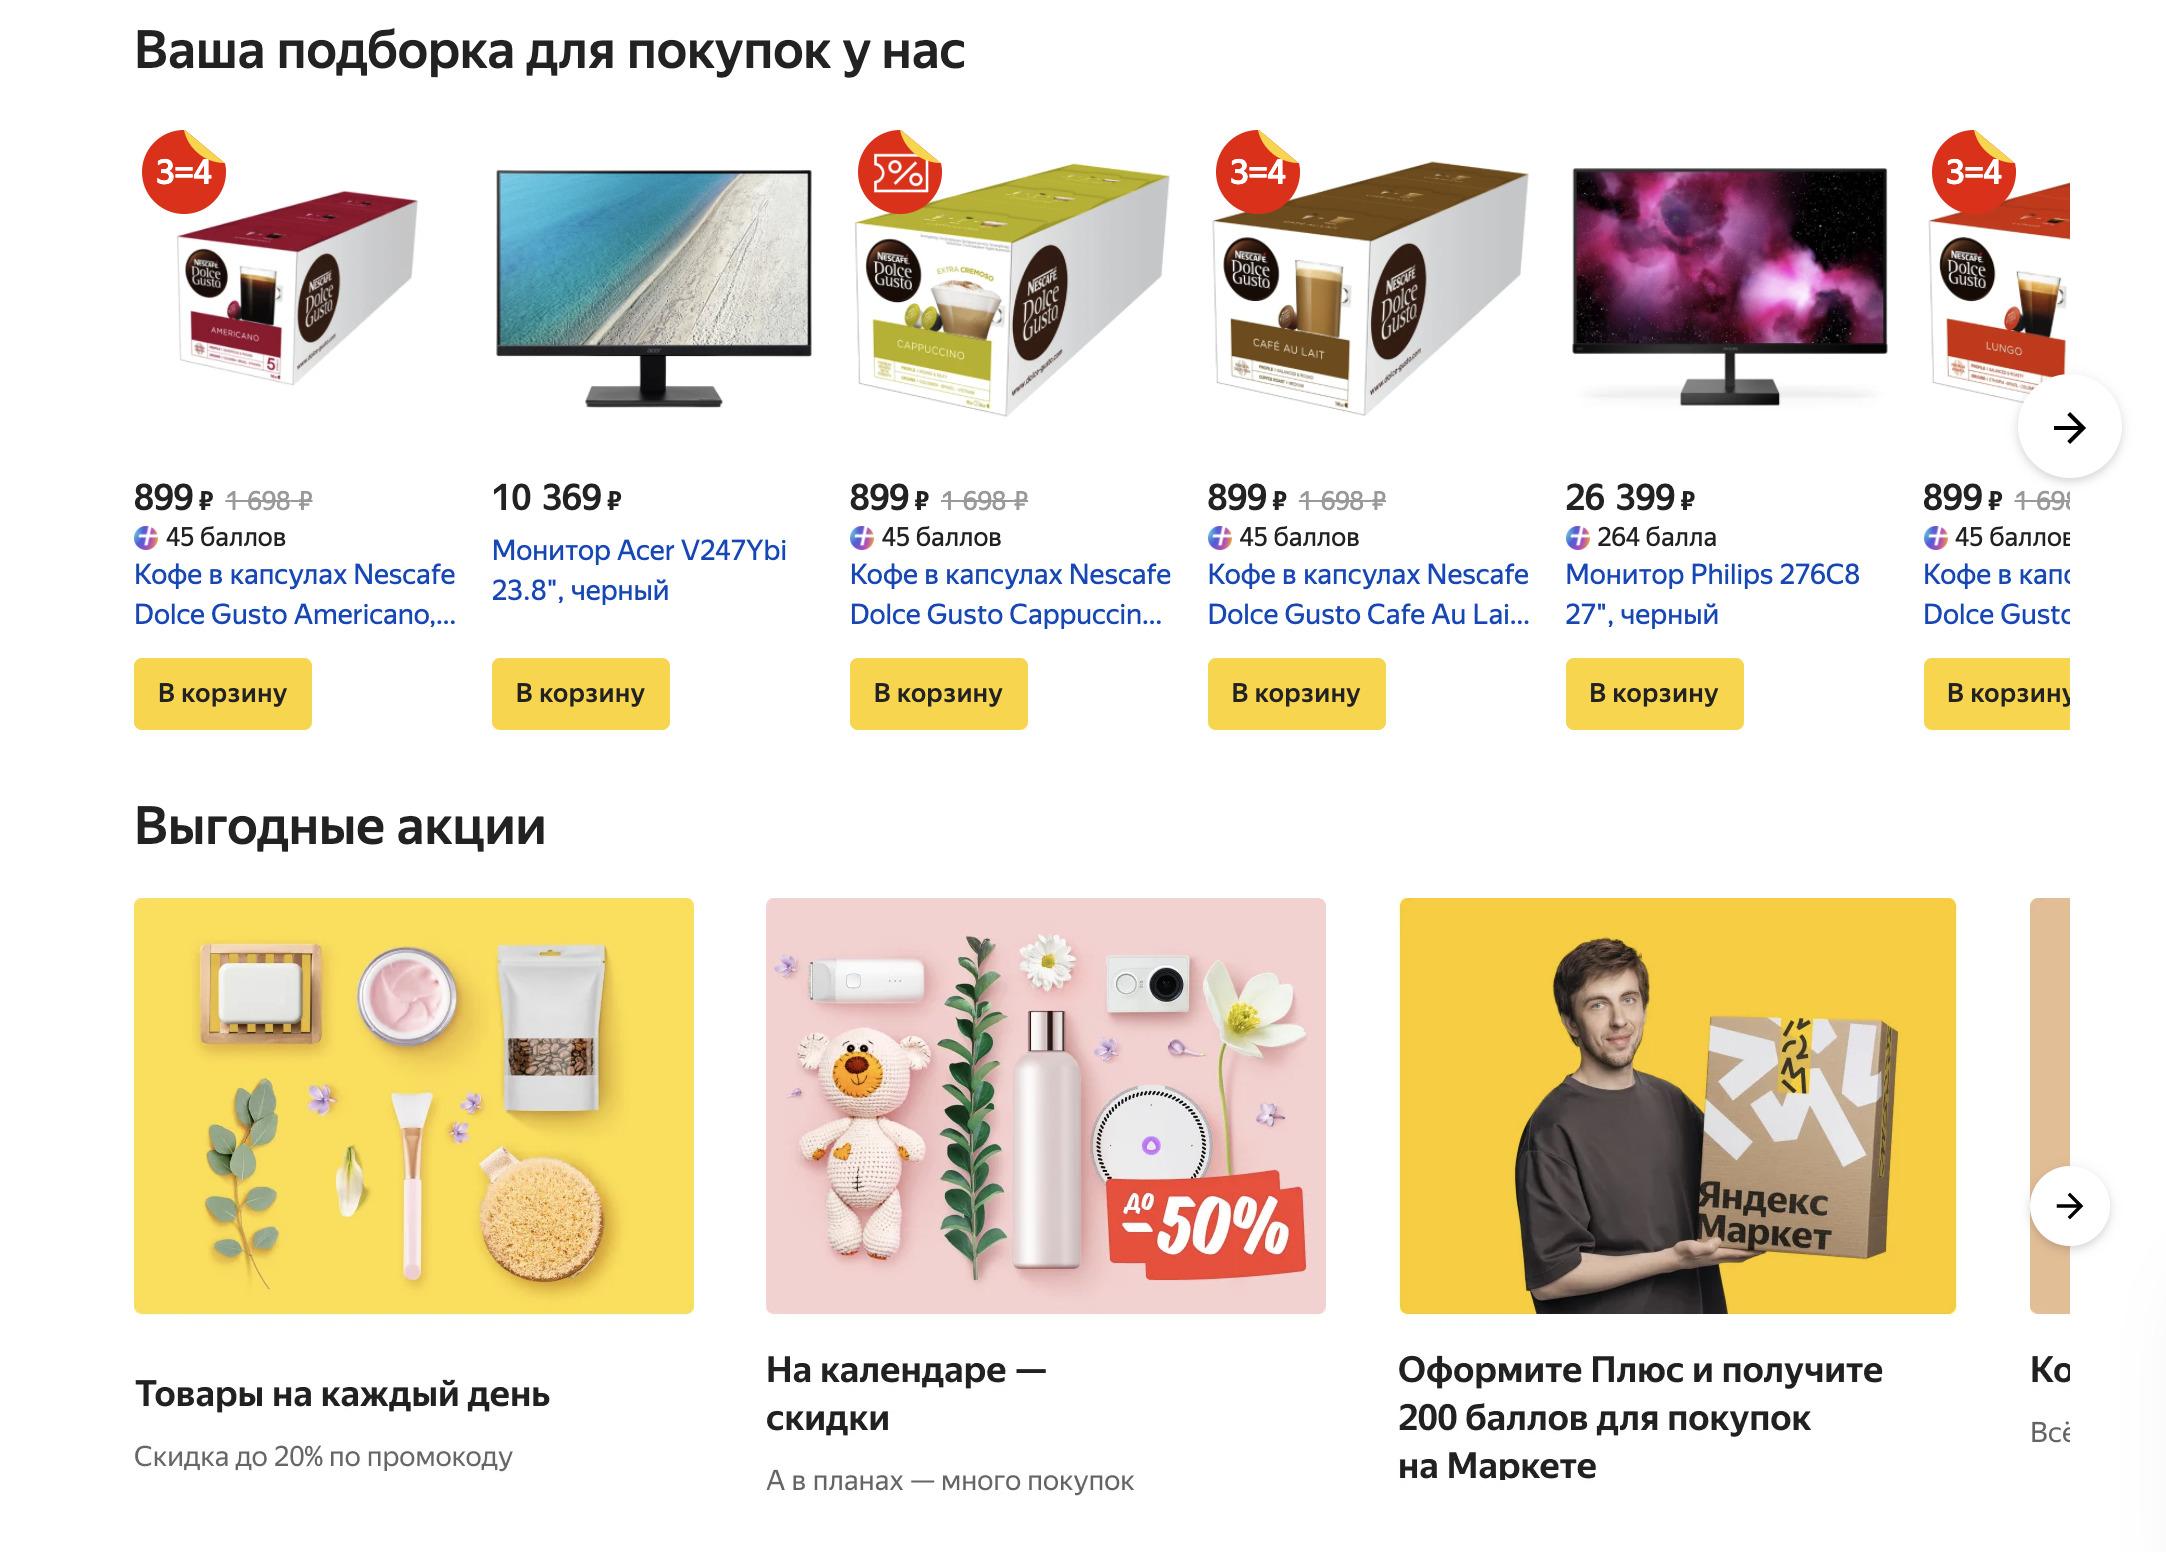 Доставка из Яндекс.Маркет в Димитровград, сроки, пункты выдачи, каталог